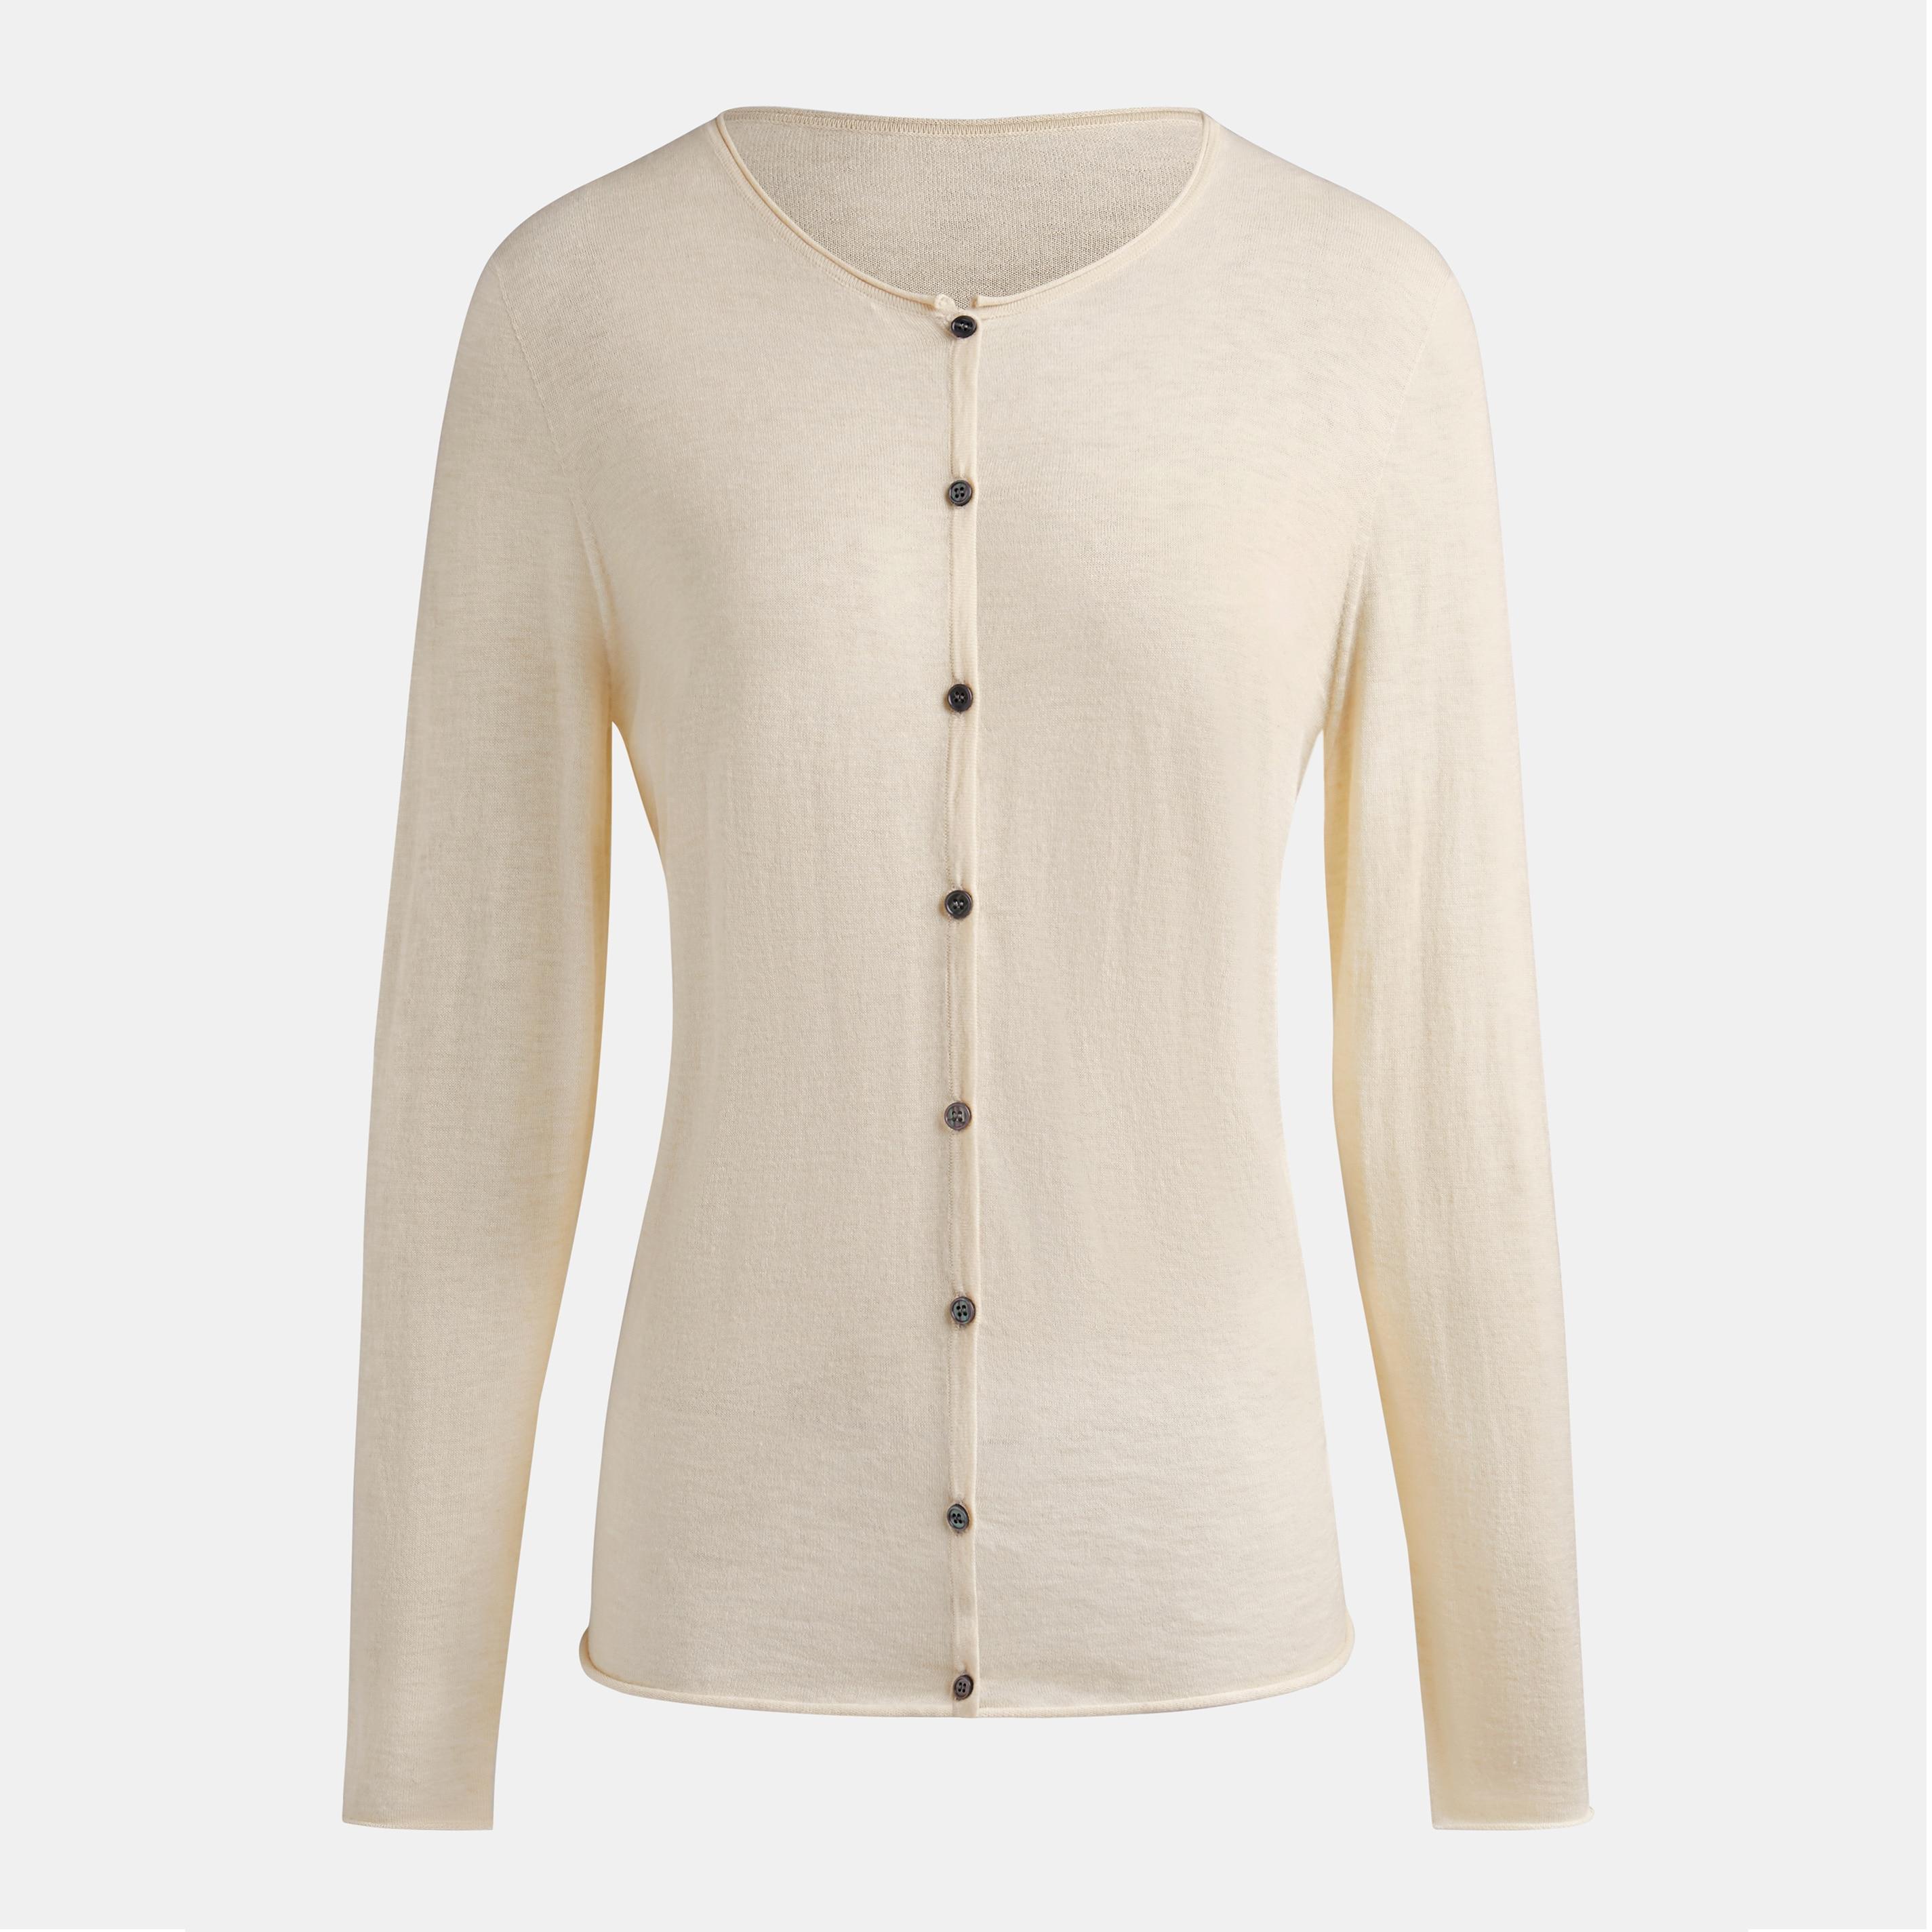 Cashmere Cardigan-Cream Ivory - Cream Ivory S